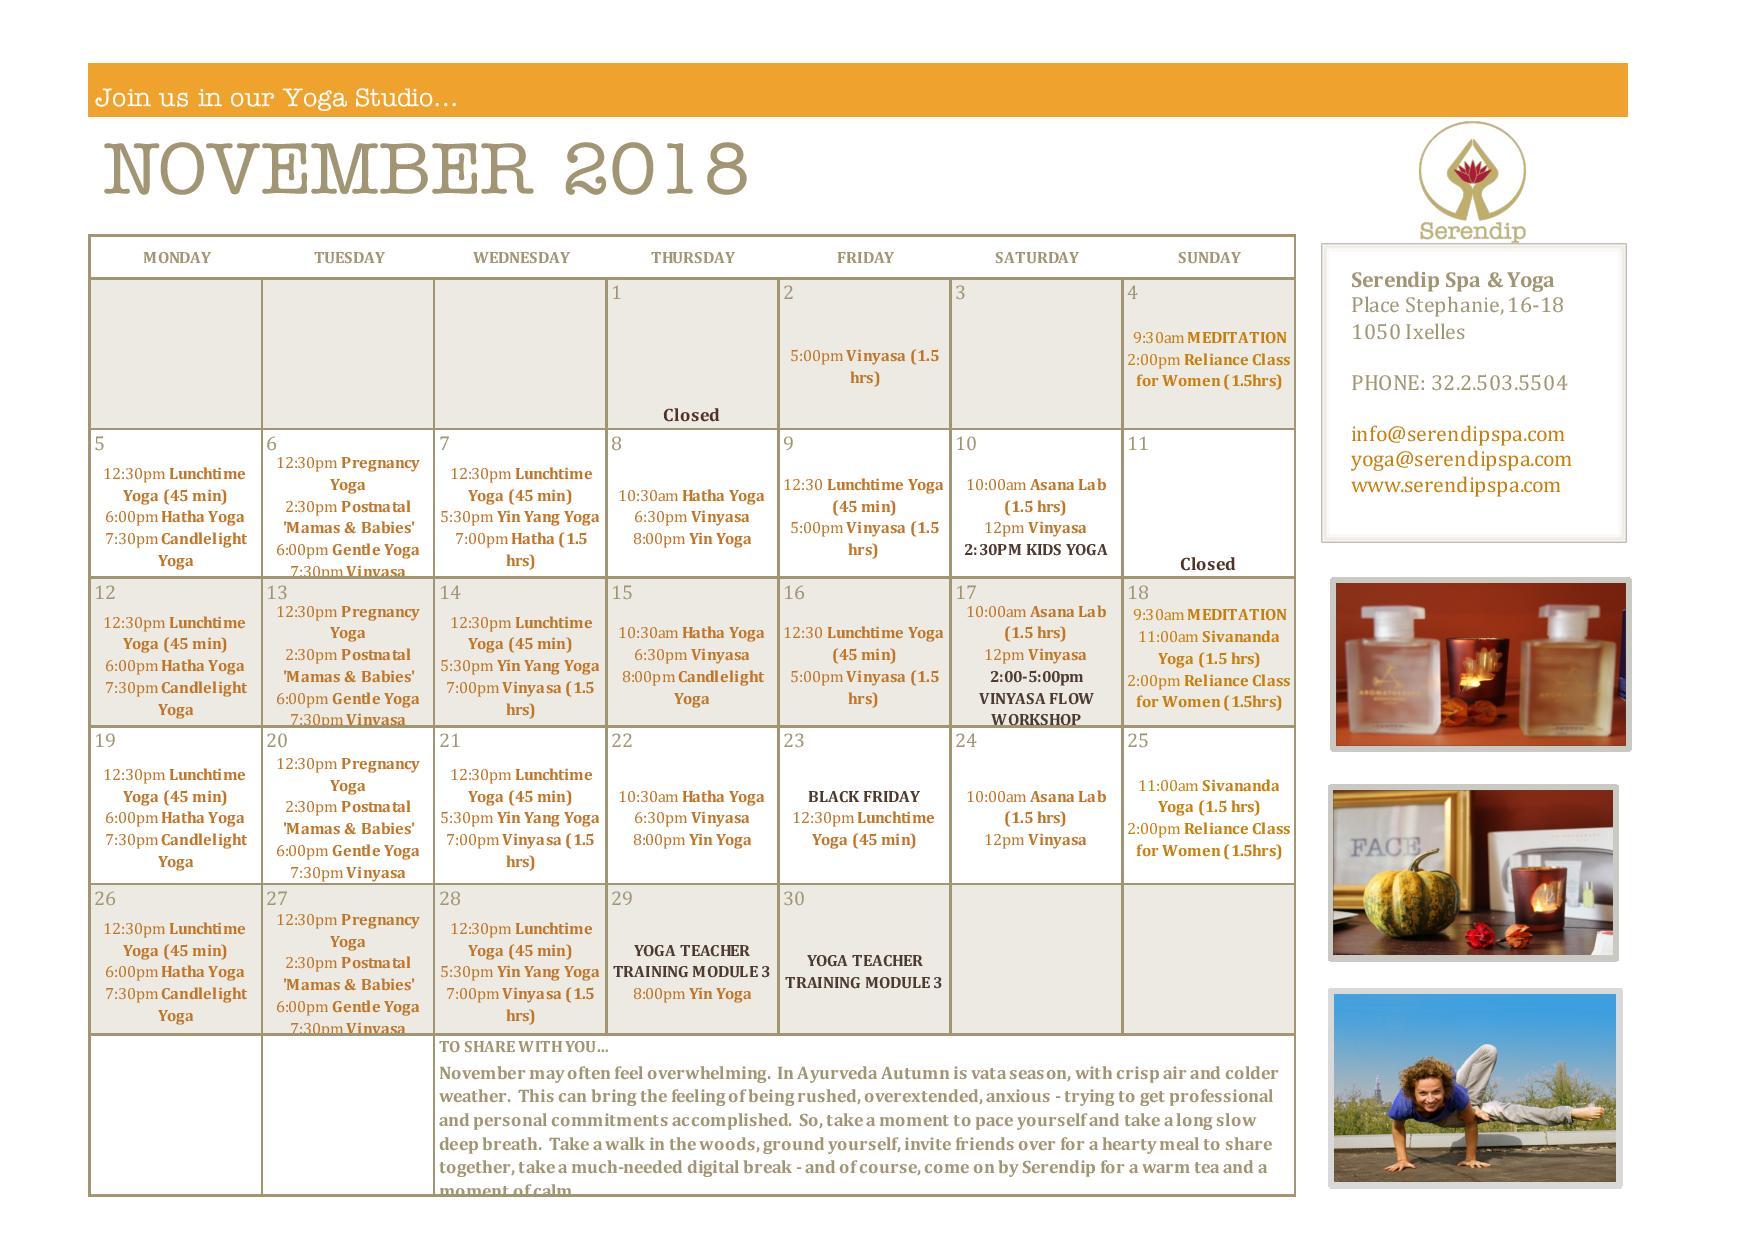 serendip spa and yoga calendar 2018_November A4 FRONT-page-001.jpg